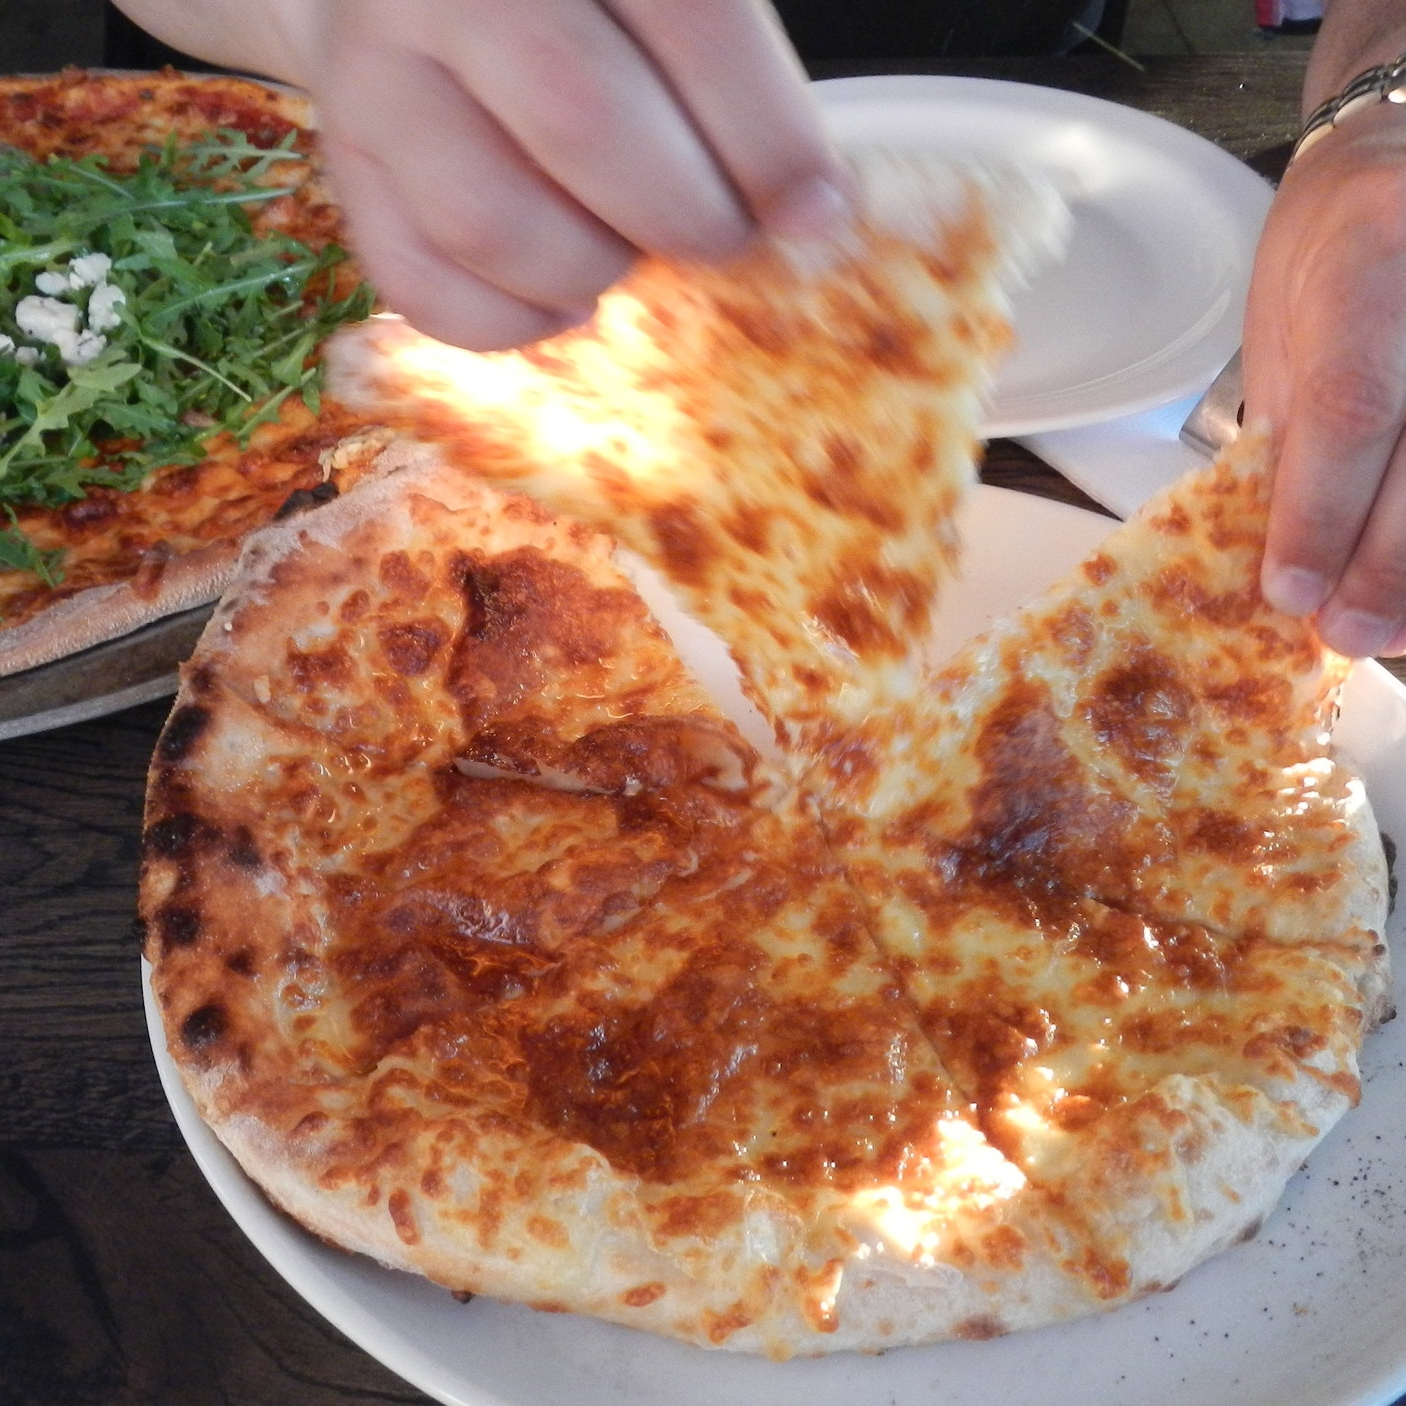 Pizza, Reykjavik by The Doubtful Traveller